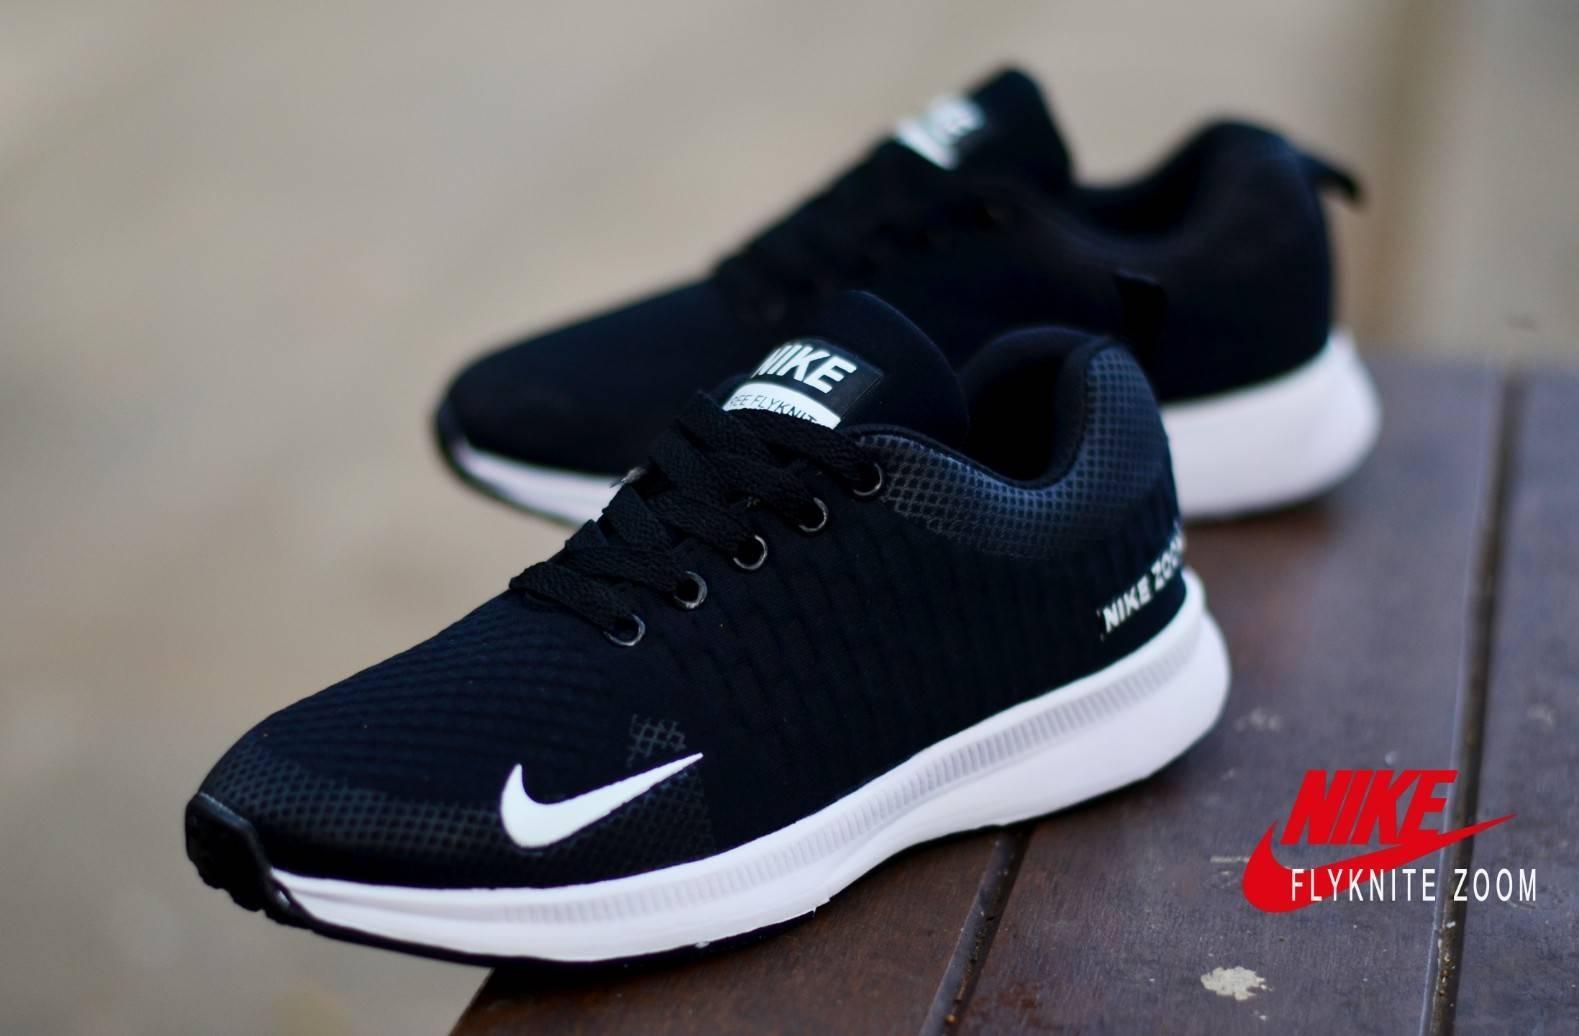 Sepatu Olahraga Pria Flyknit Zoom import Termurah (Sepatu Running  6023e2f686